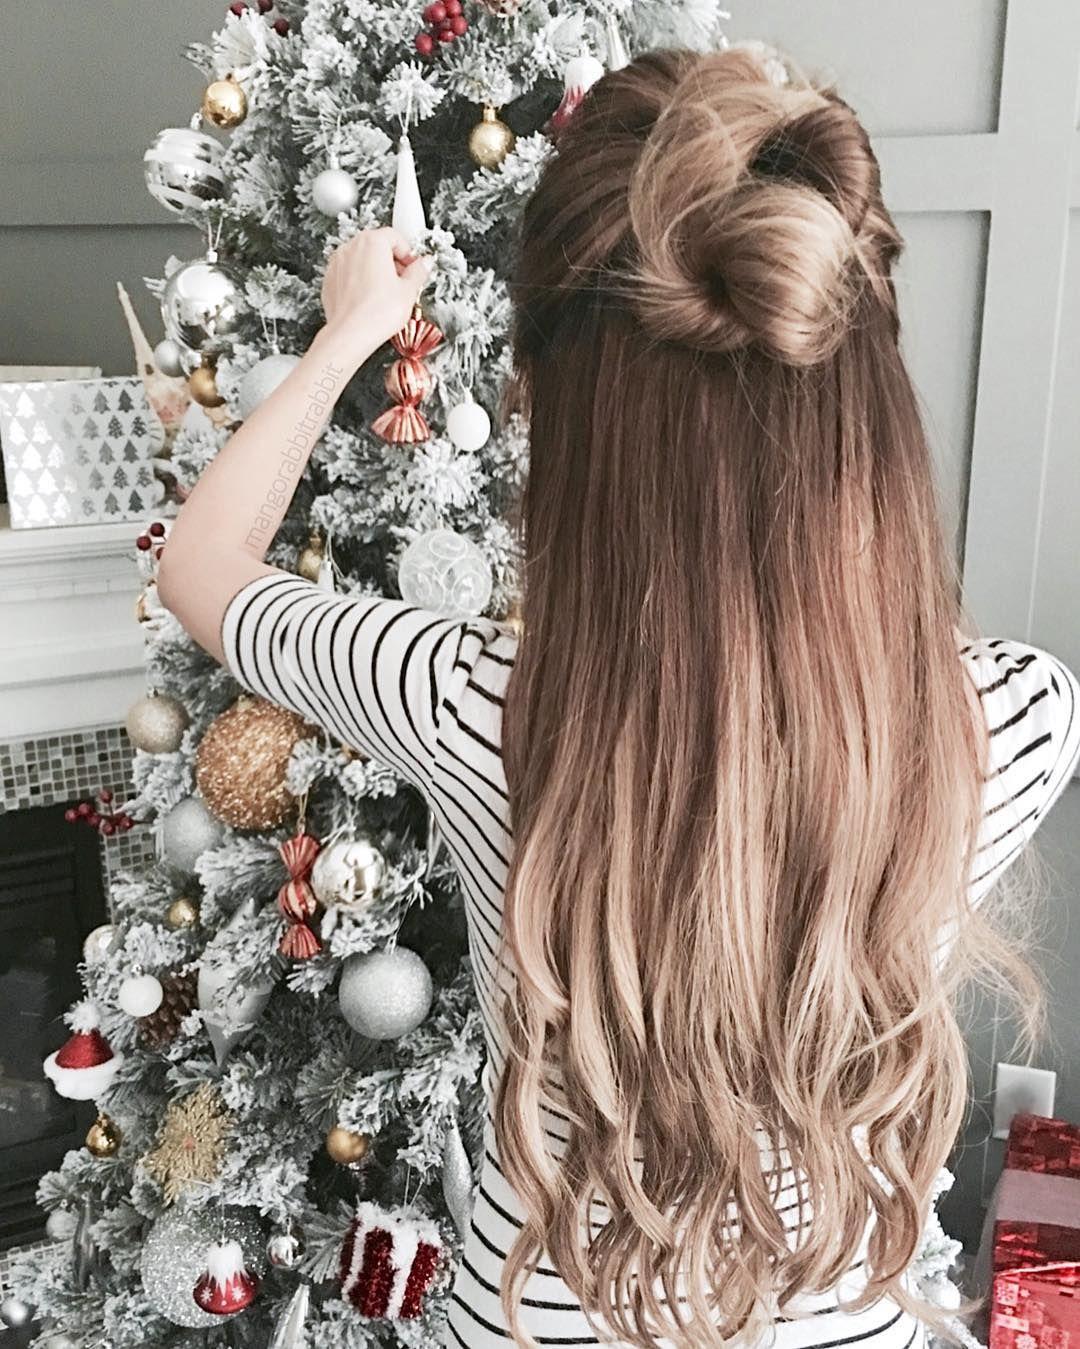 How To Dress Up Like A Boss On Christmas Eve Hair Styles Beautiful Hair Hair Inspiration